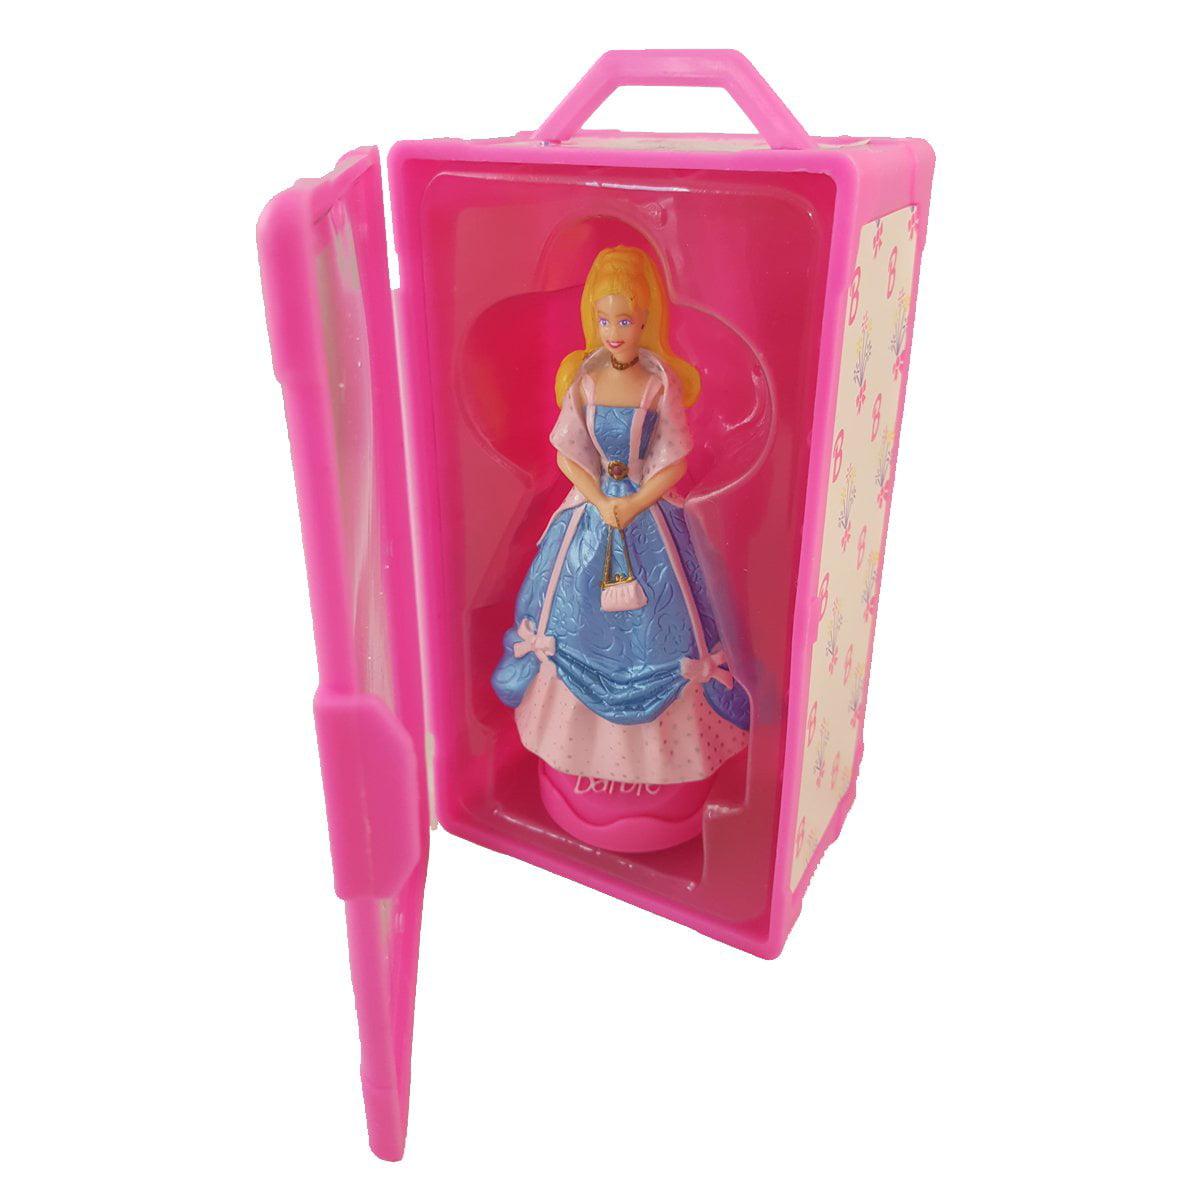 1997 Mattel Barbie Doll Spring Blue Dress Pink Petticoats Dress Stamper in Plastic Pink... by Tara Toy Company